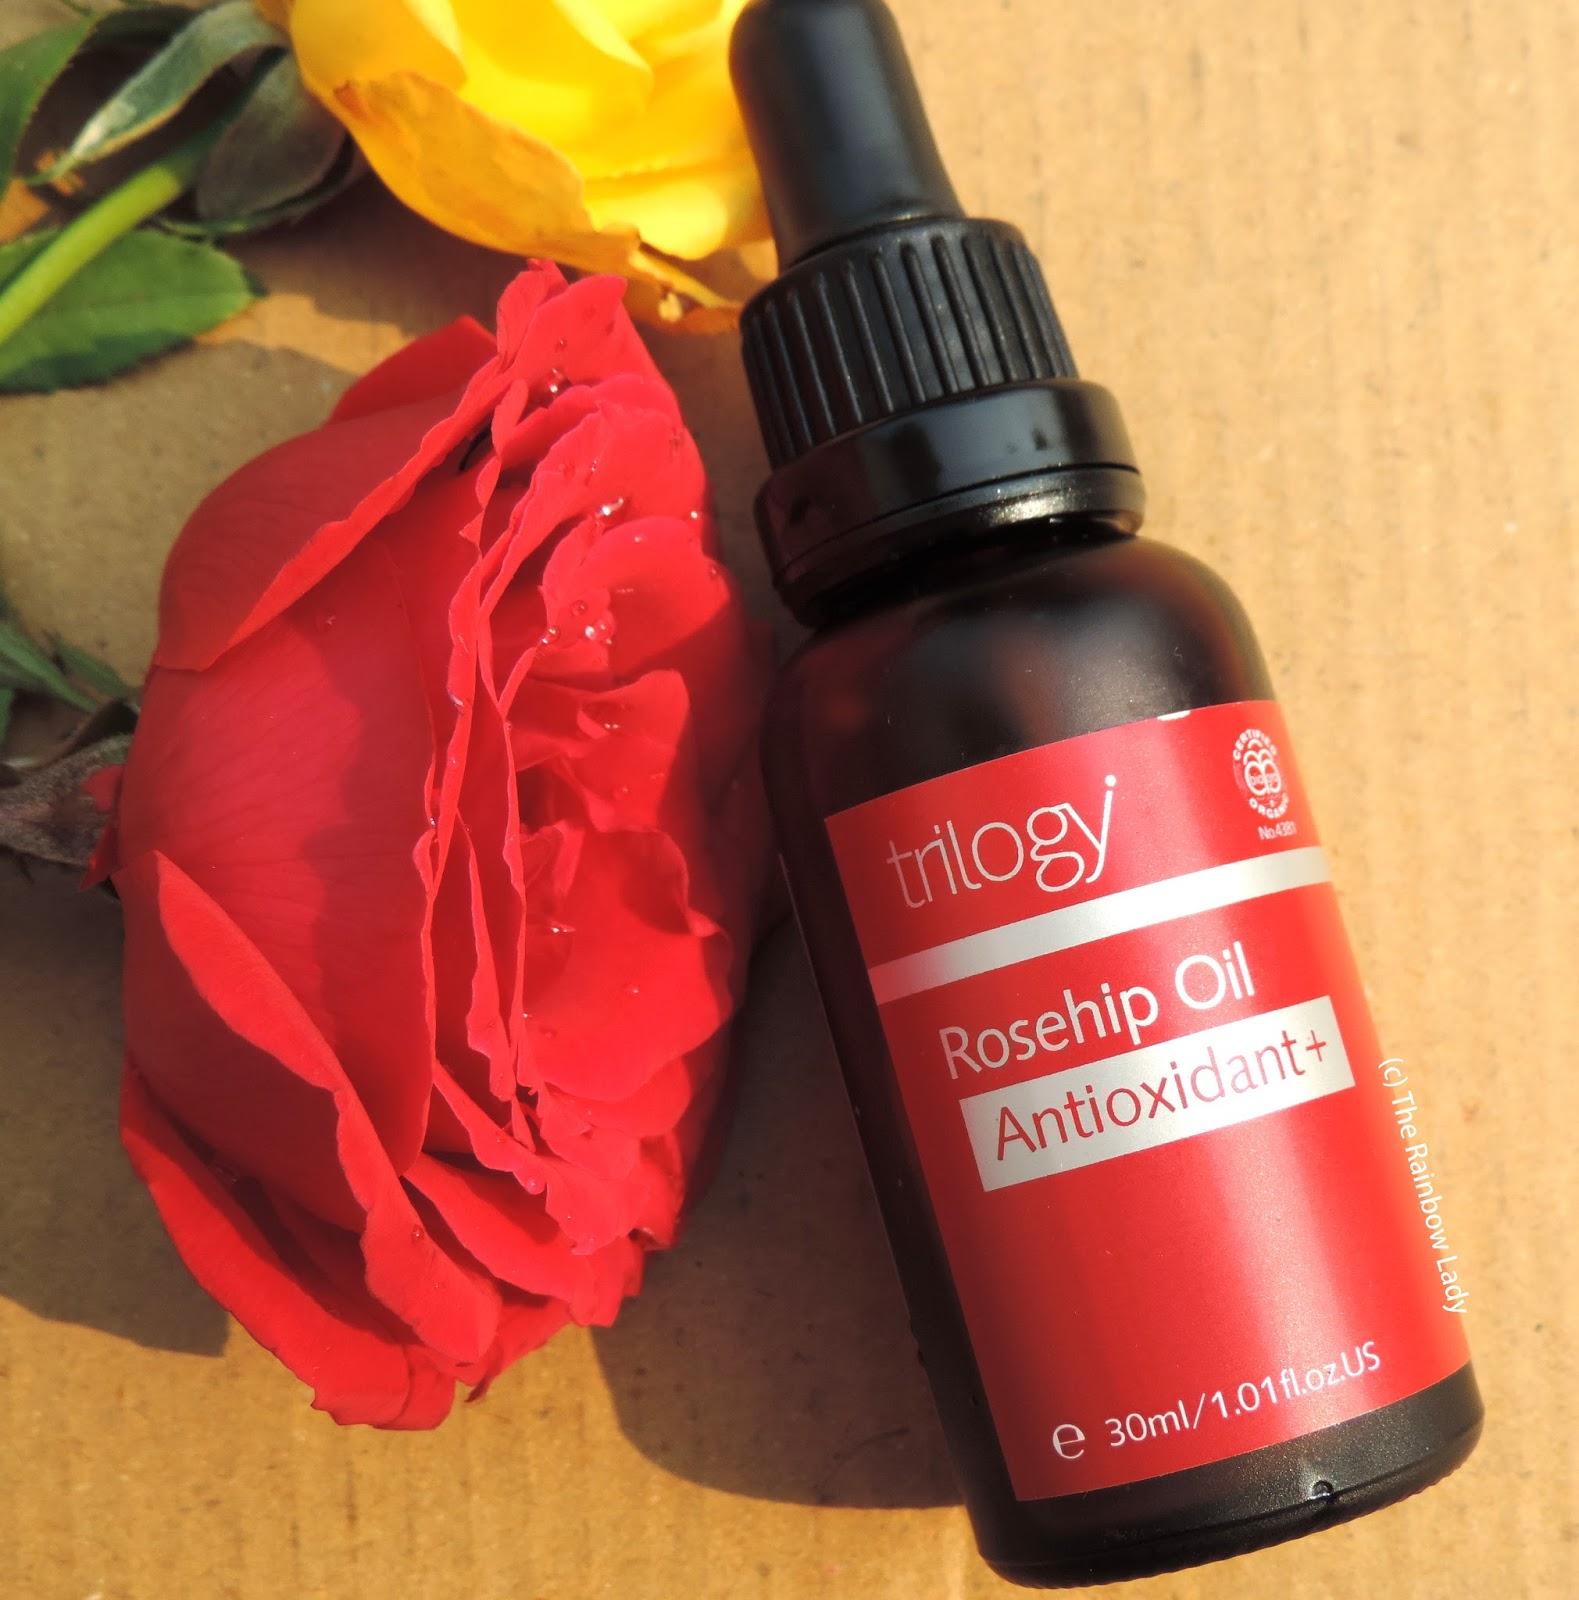 Trilogy Rosehip Antioxidant Facial Oil Review The Rainbow Lady Blog